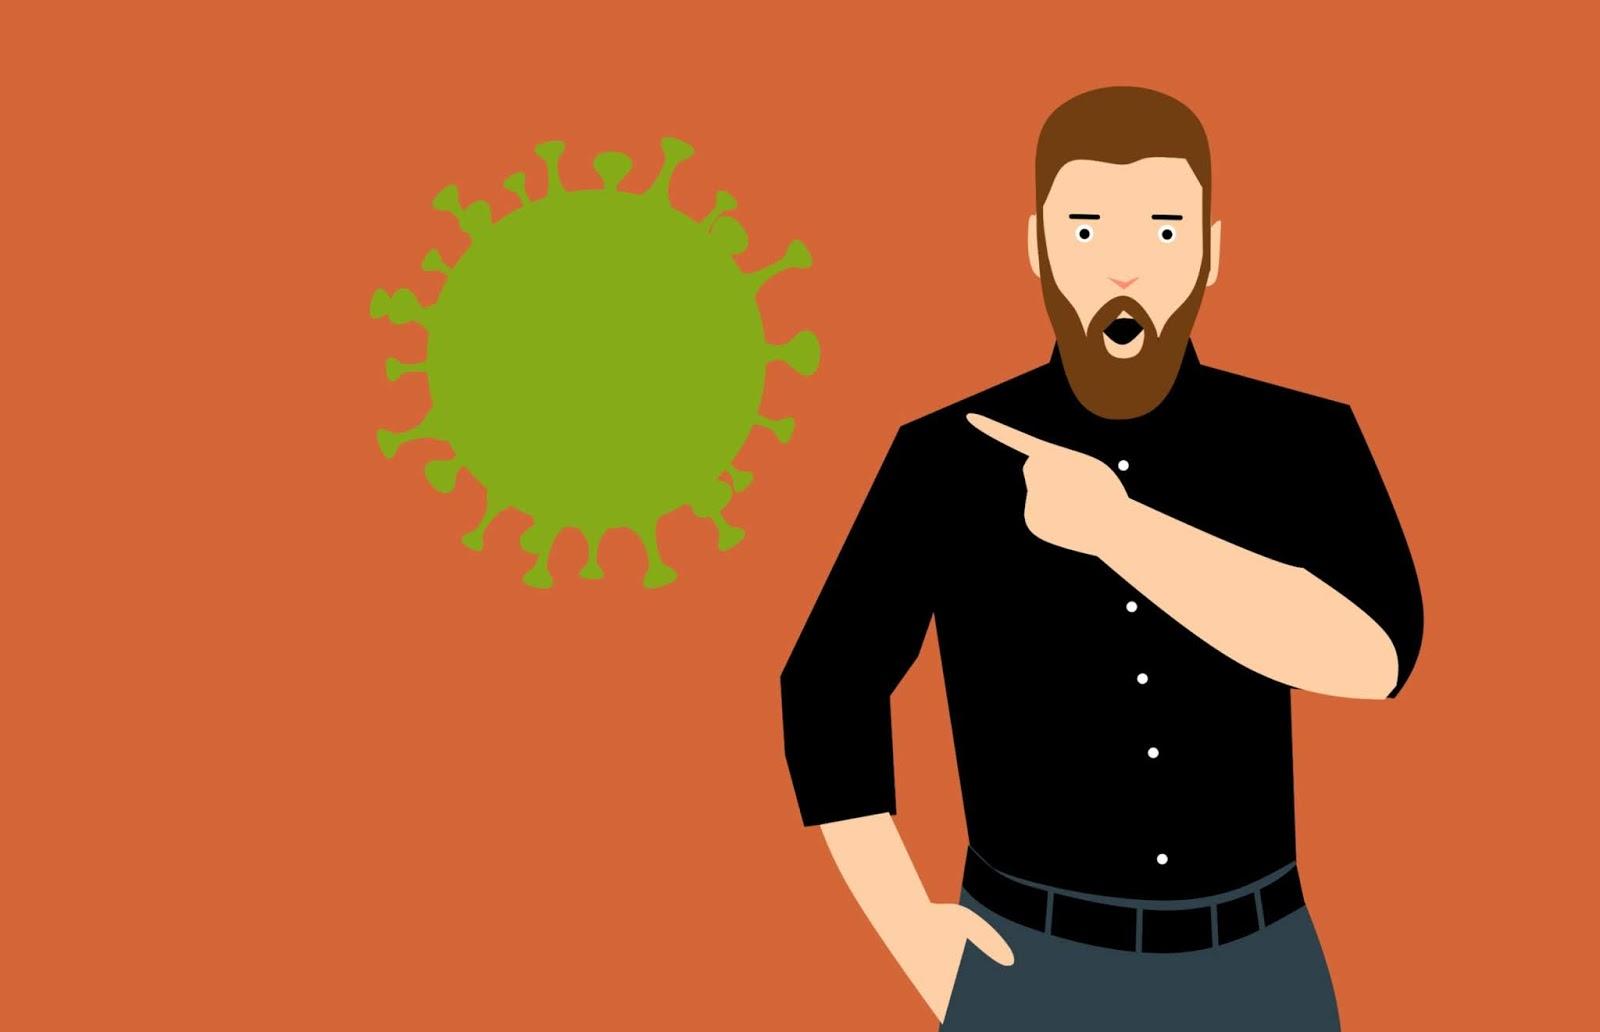 illustrations of fear of corona virus